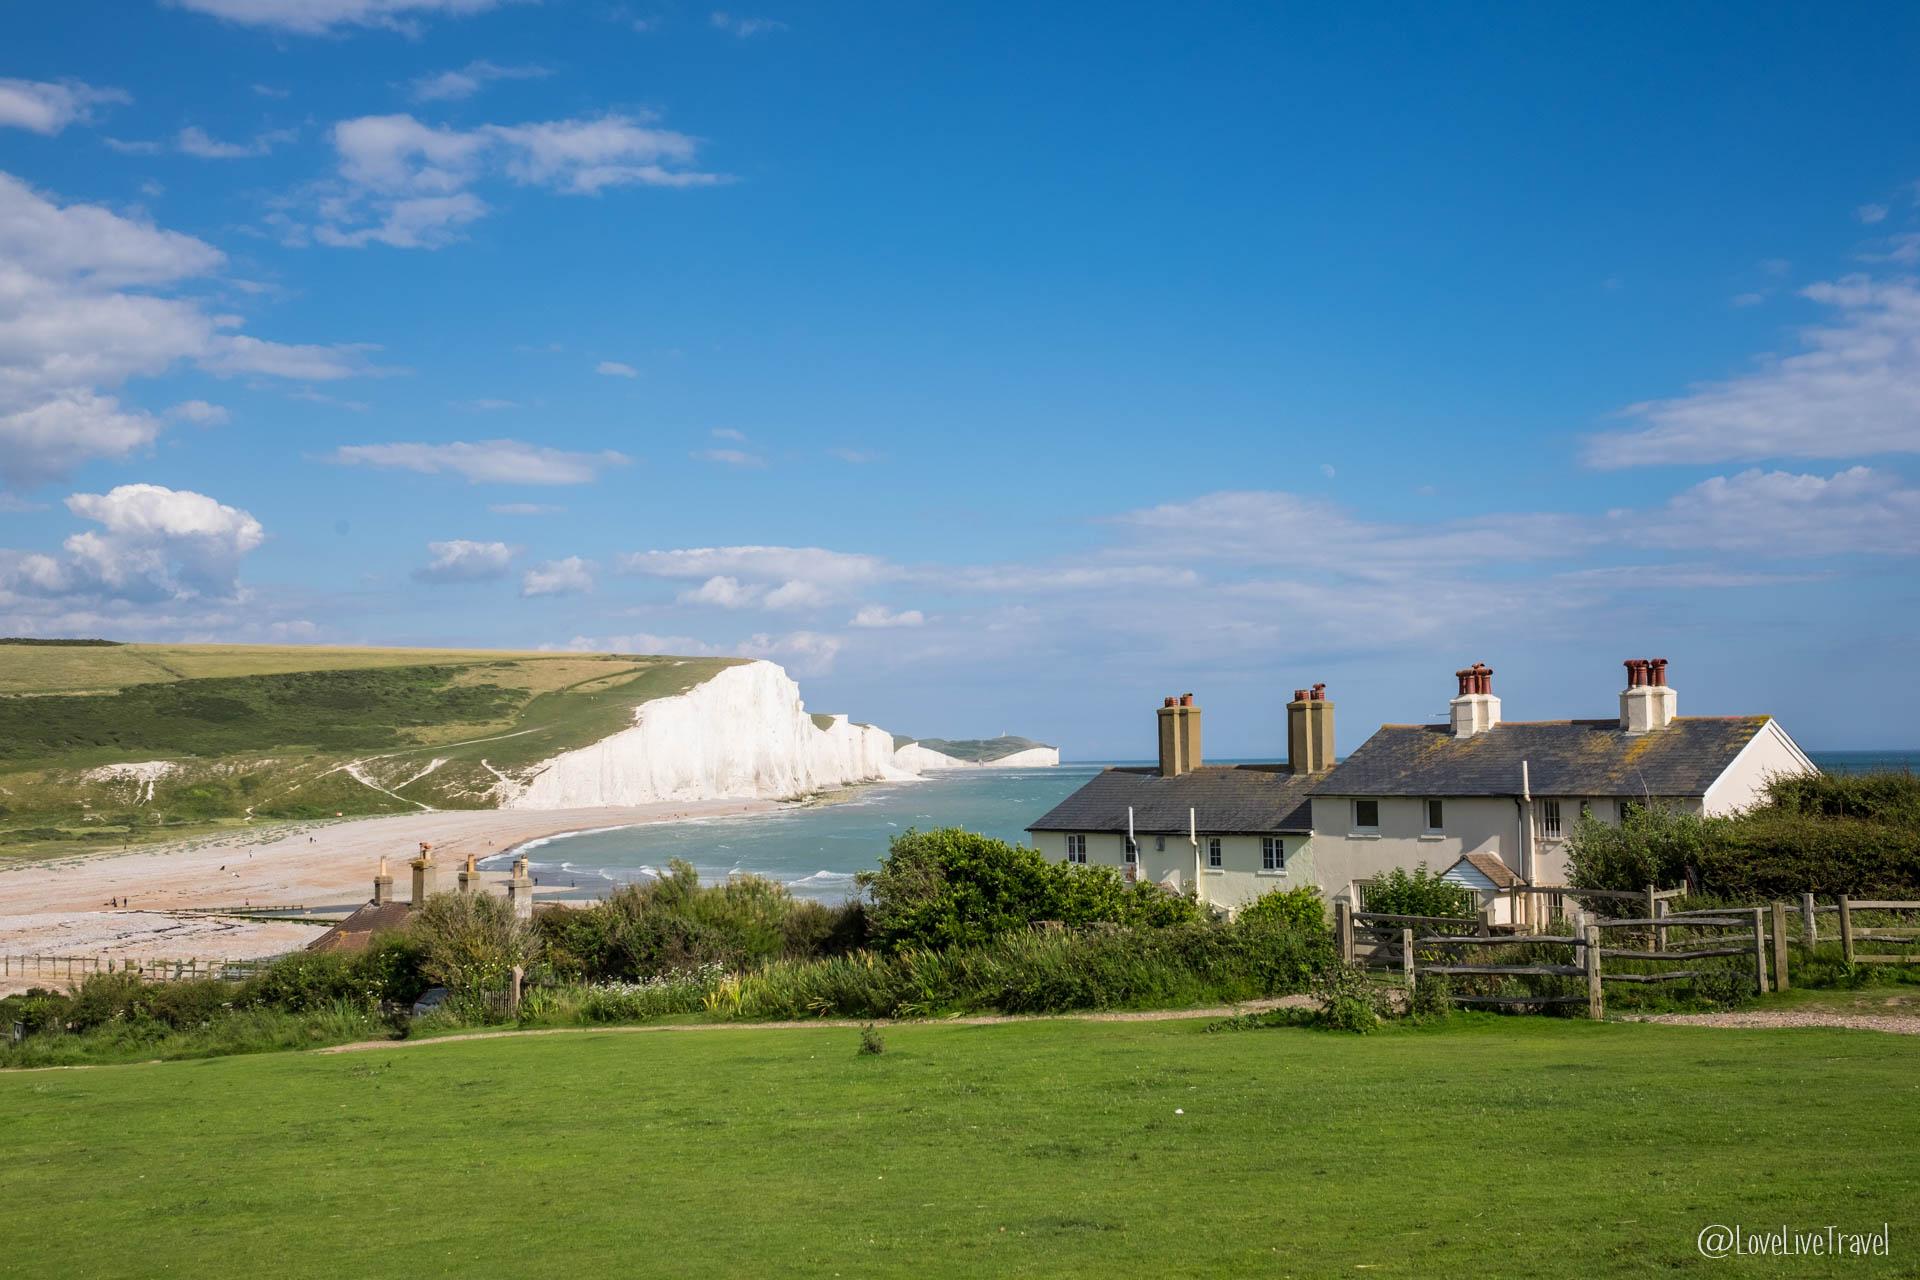 Sussex, sud de la Grande-Bretagne, en 4 jours